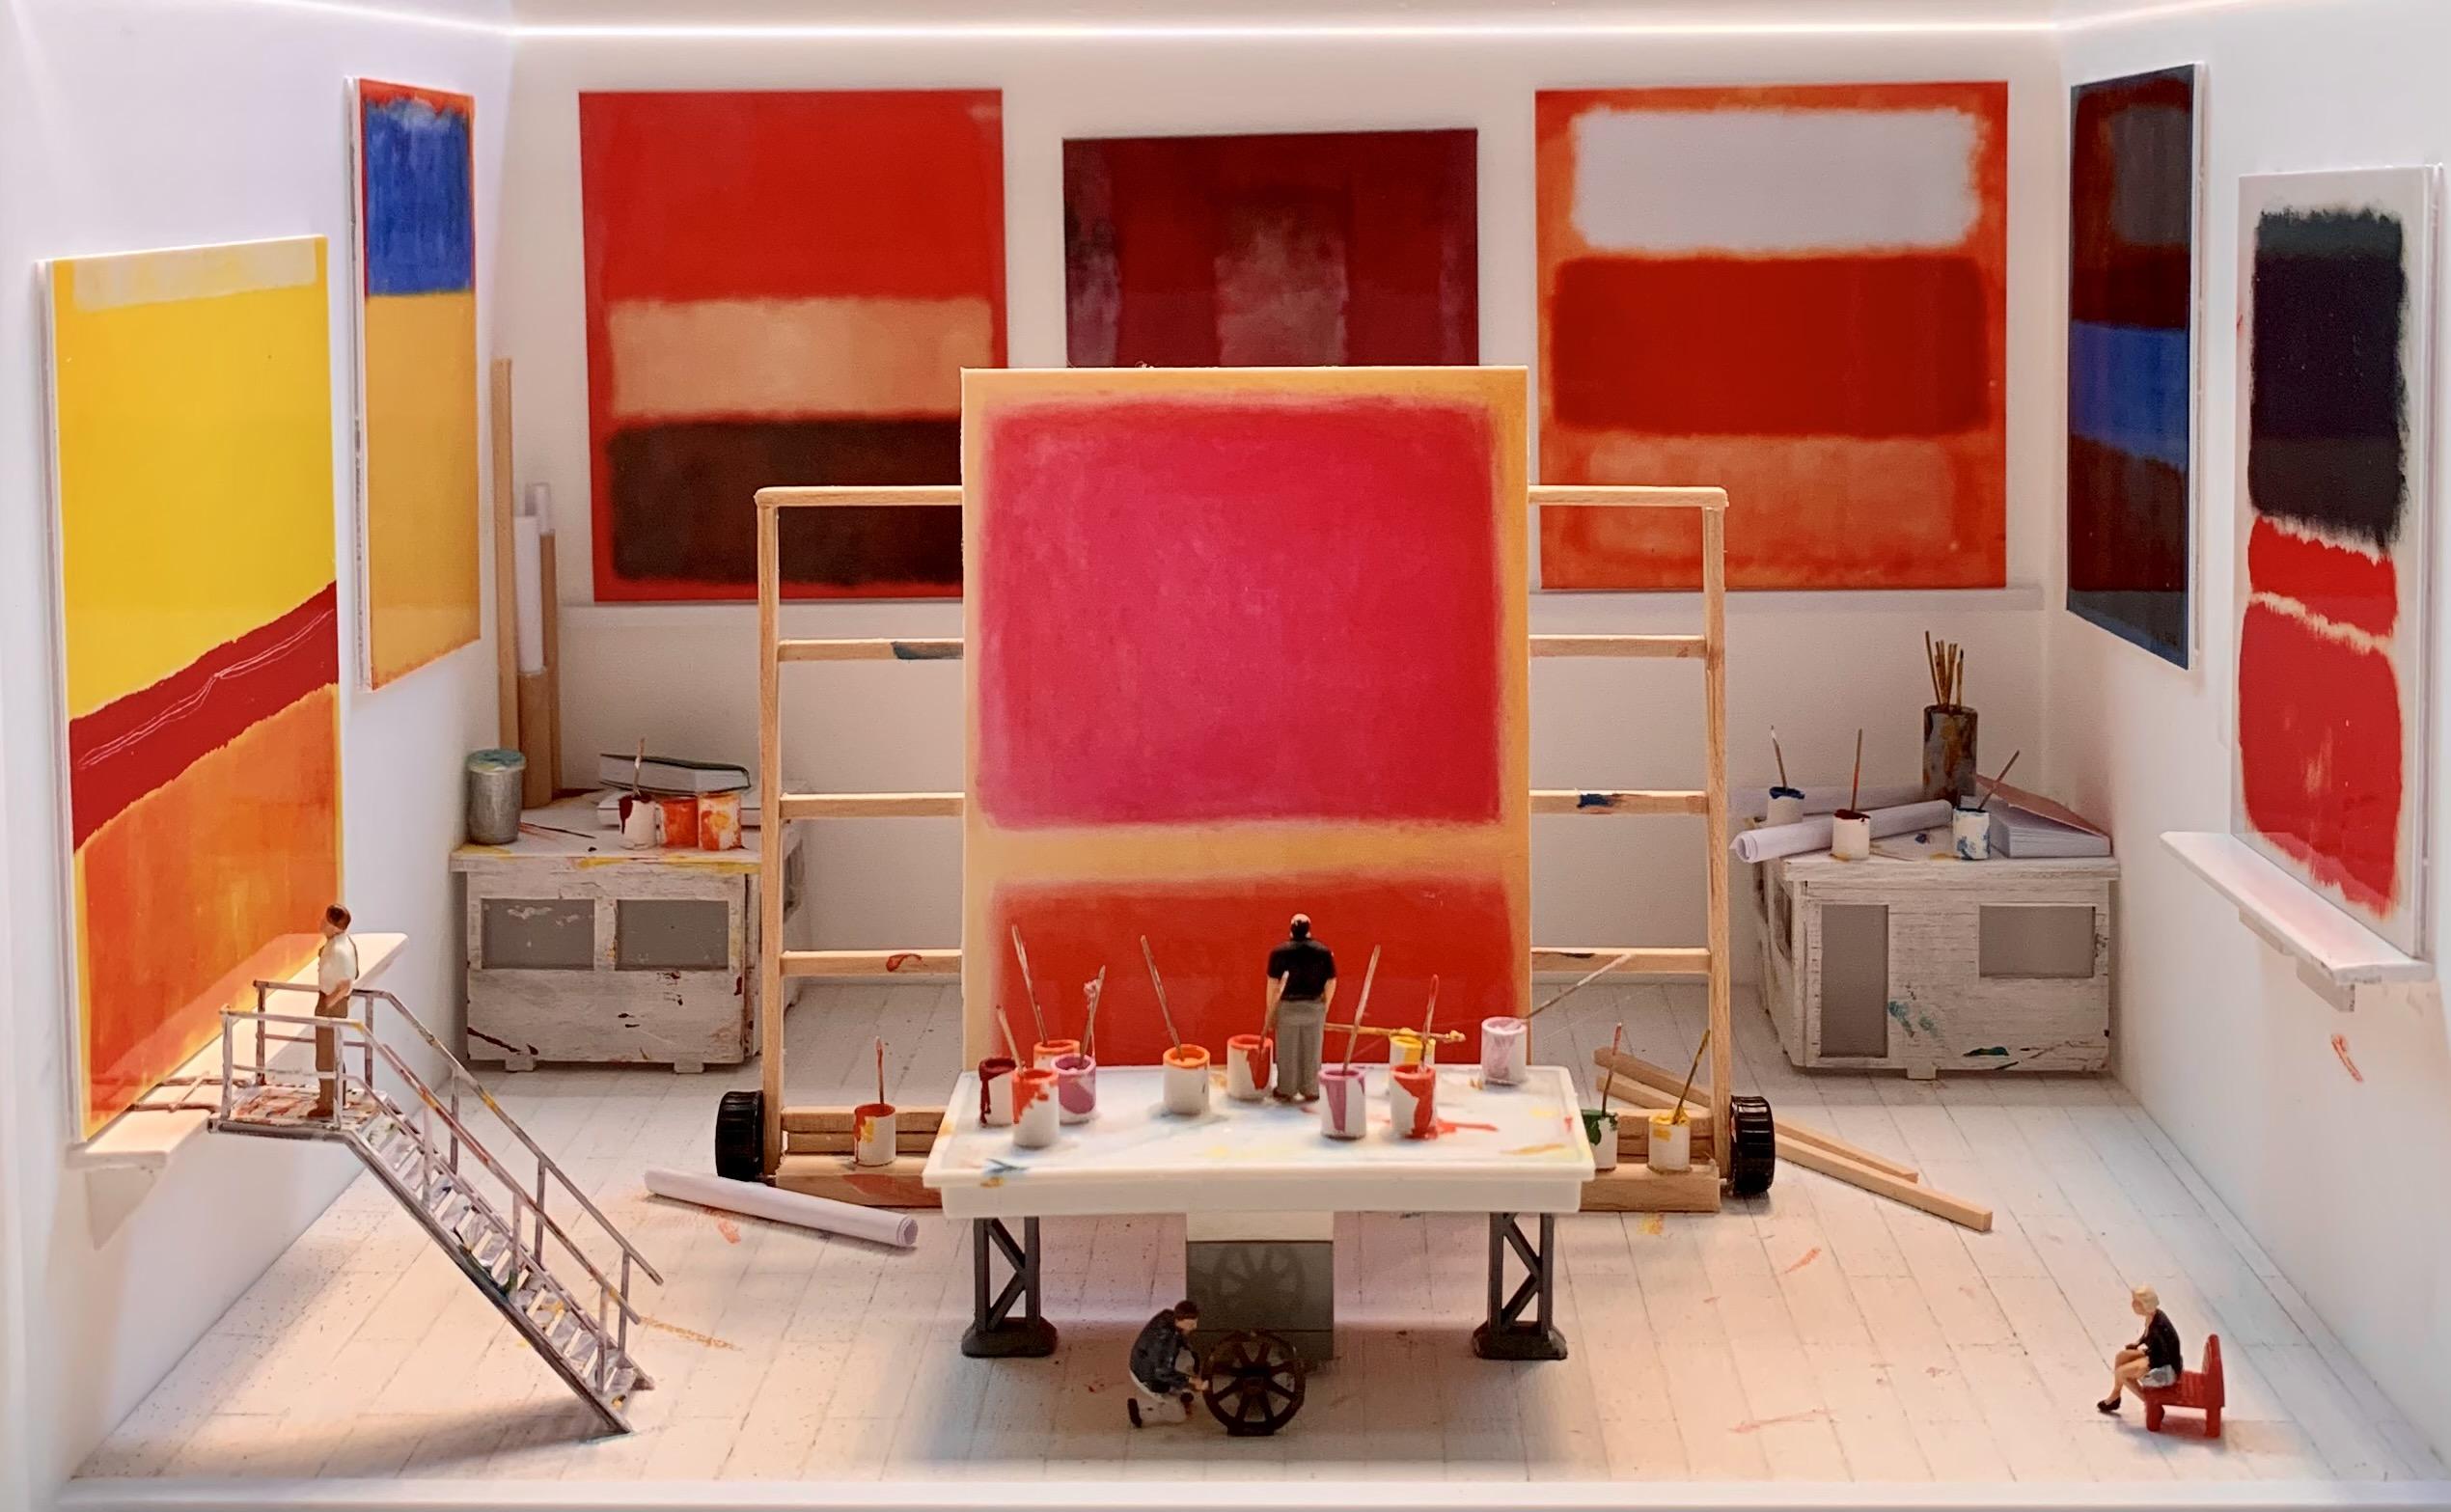 Dans l'atelier de Rothko